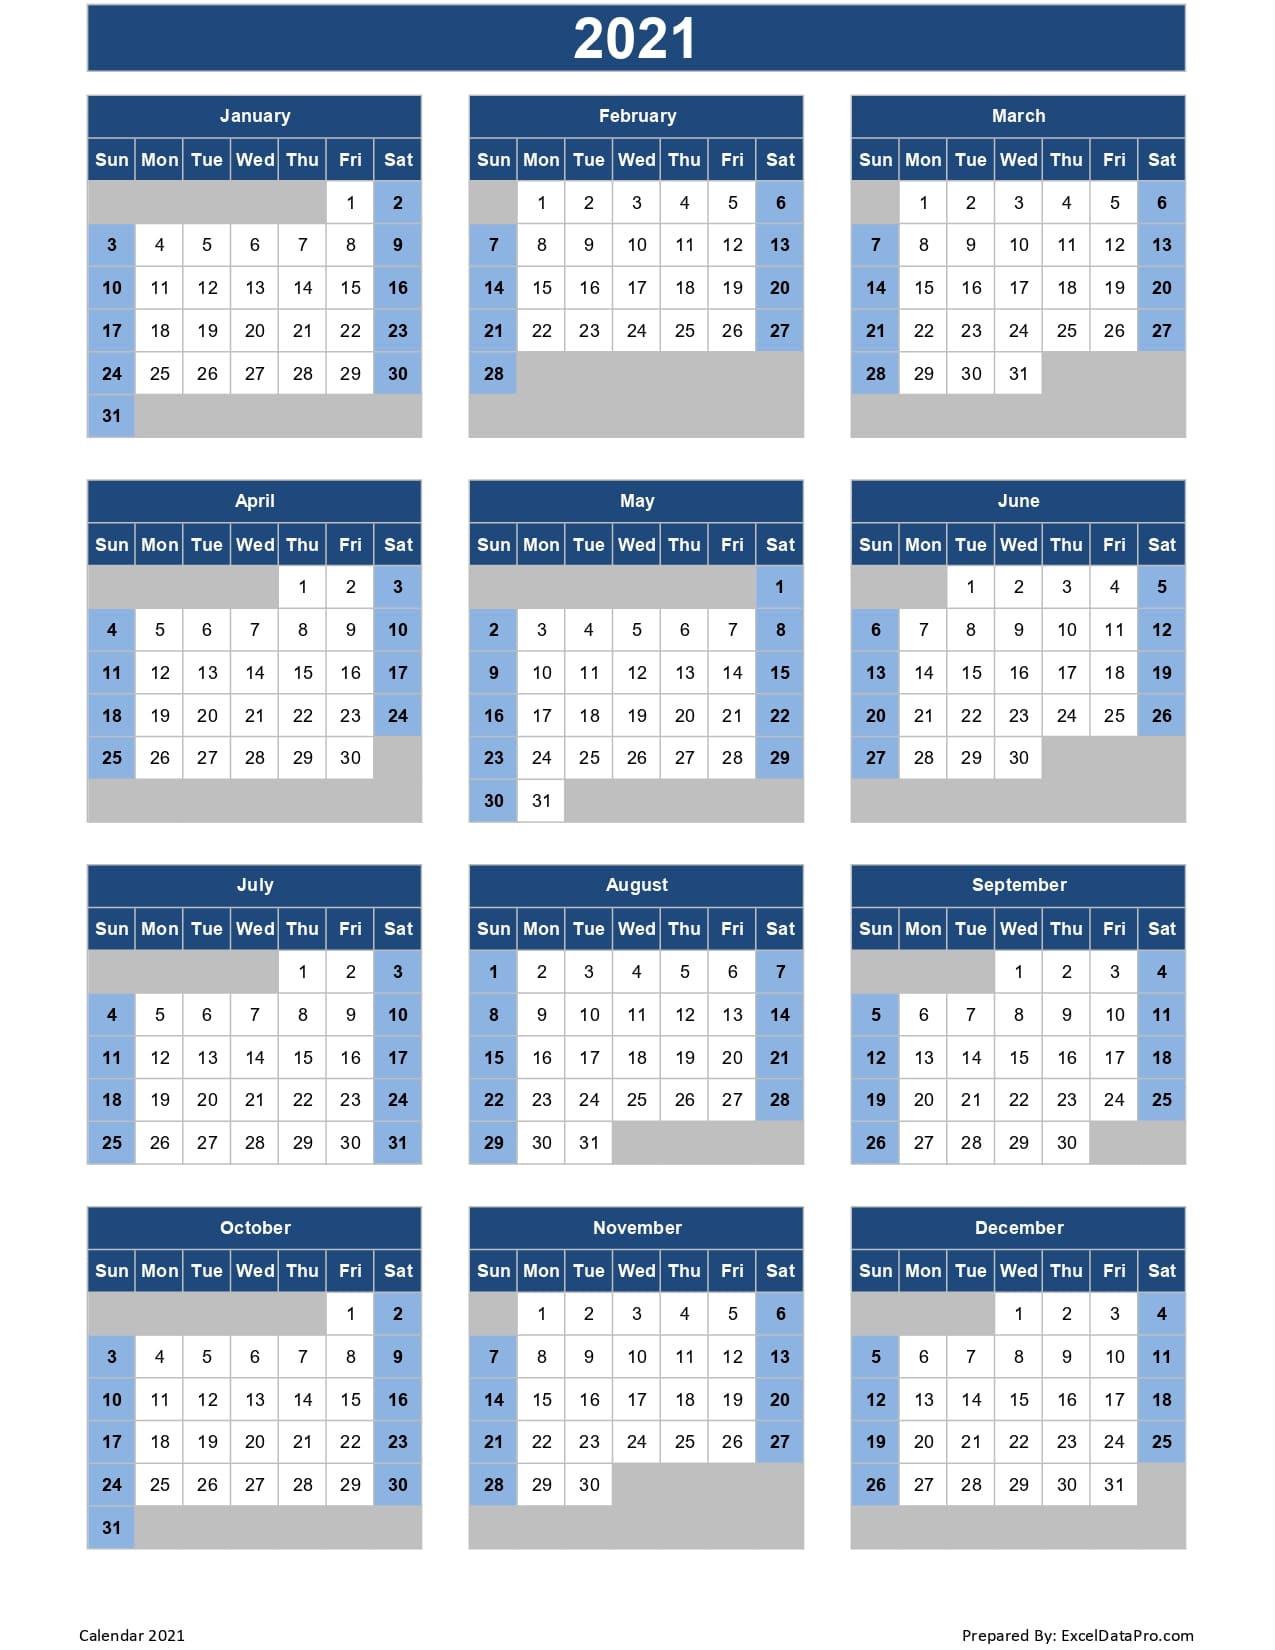 Calendar 2021 Excel Templates, Printable Pdfs & Images  Julian Calendar 2021 2021 Free Printable